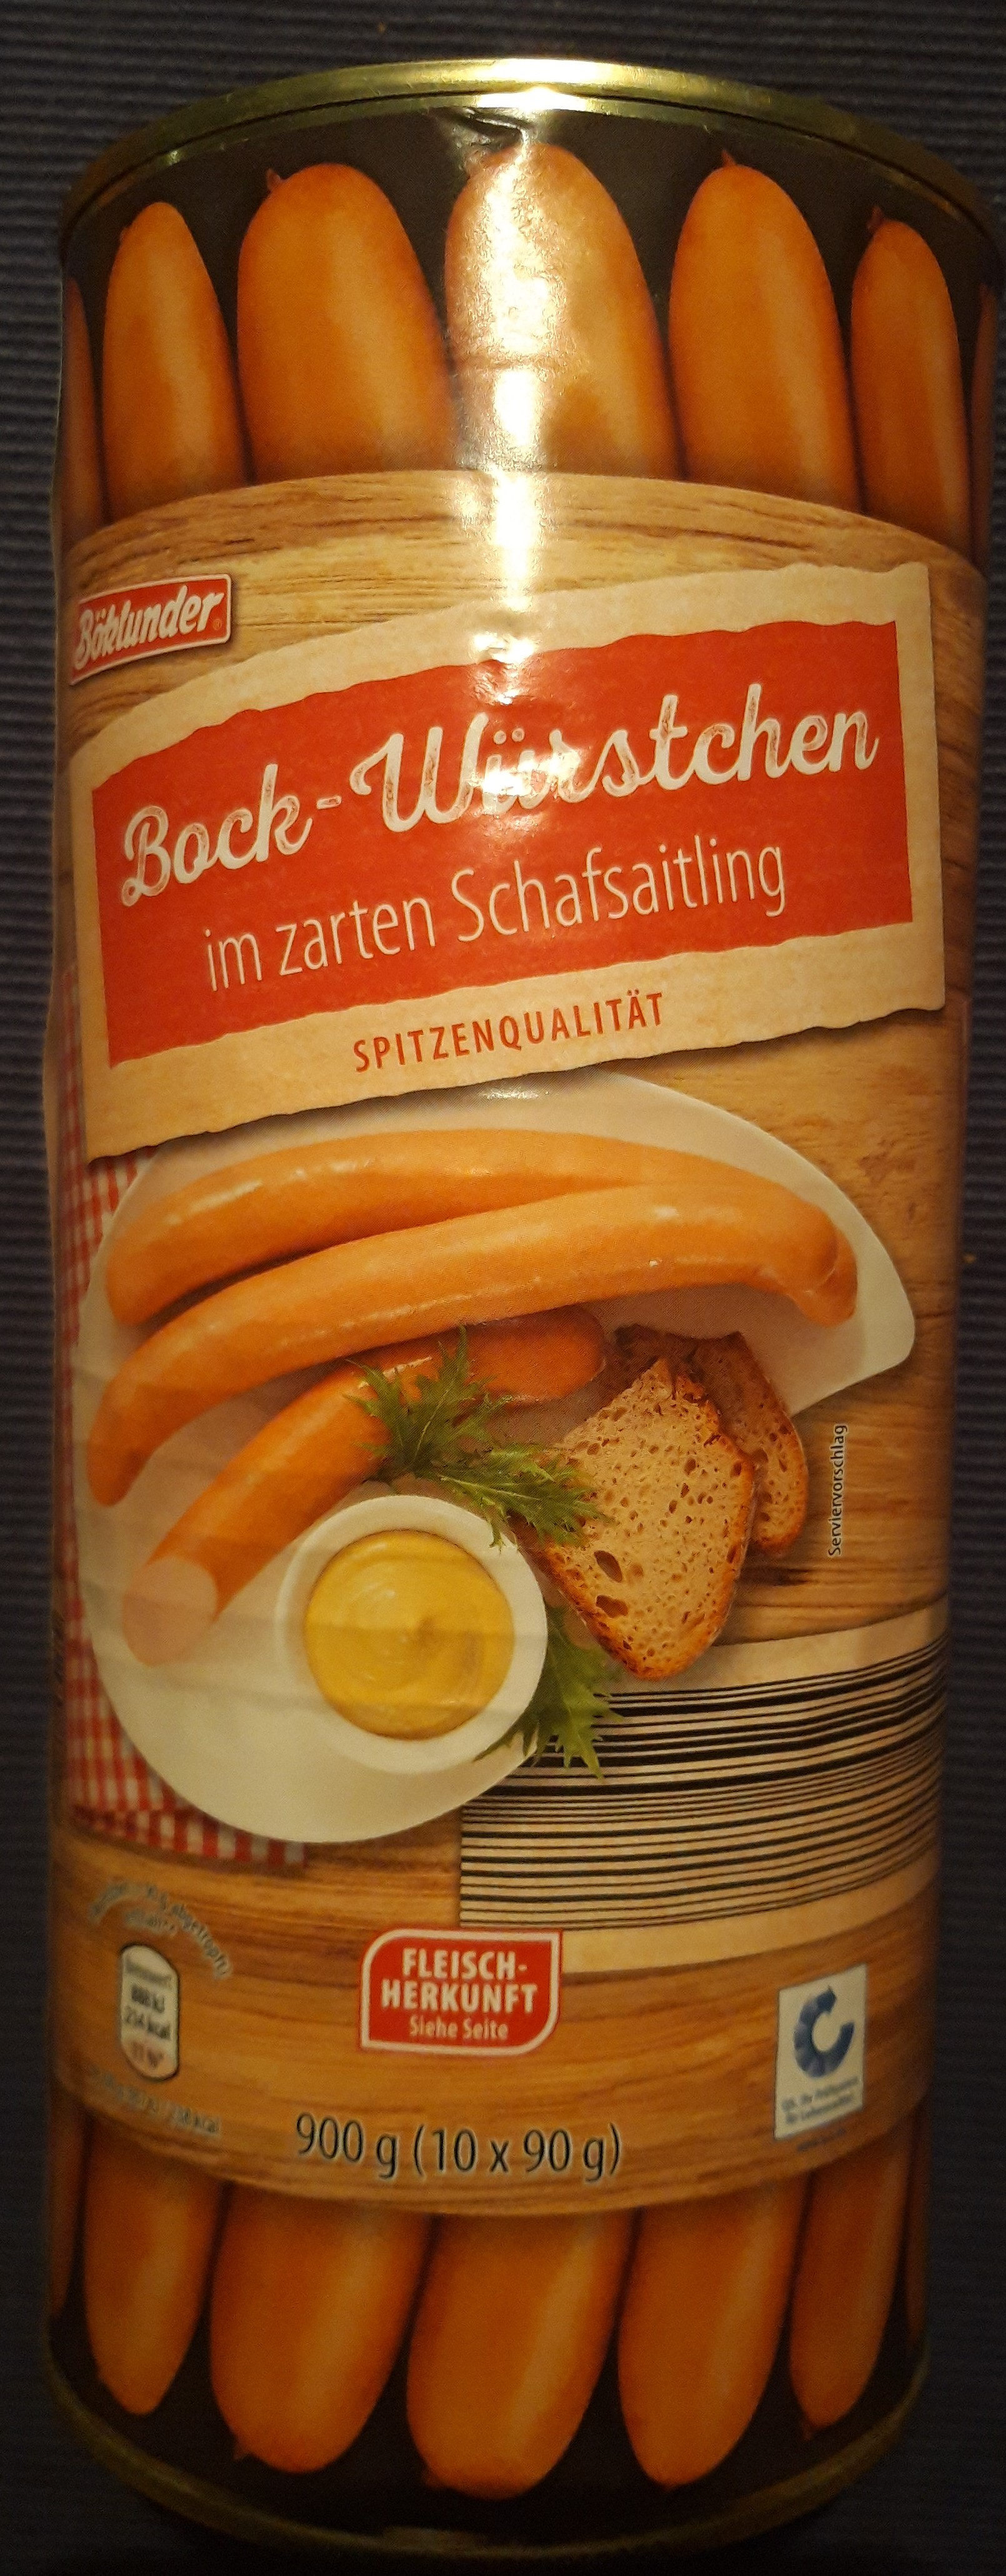 Bock-Würstchen - Product - de